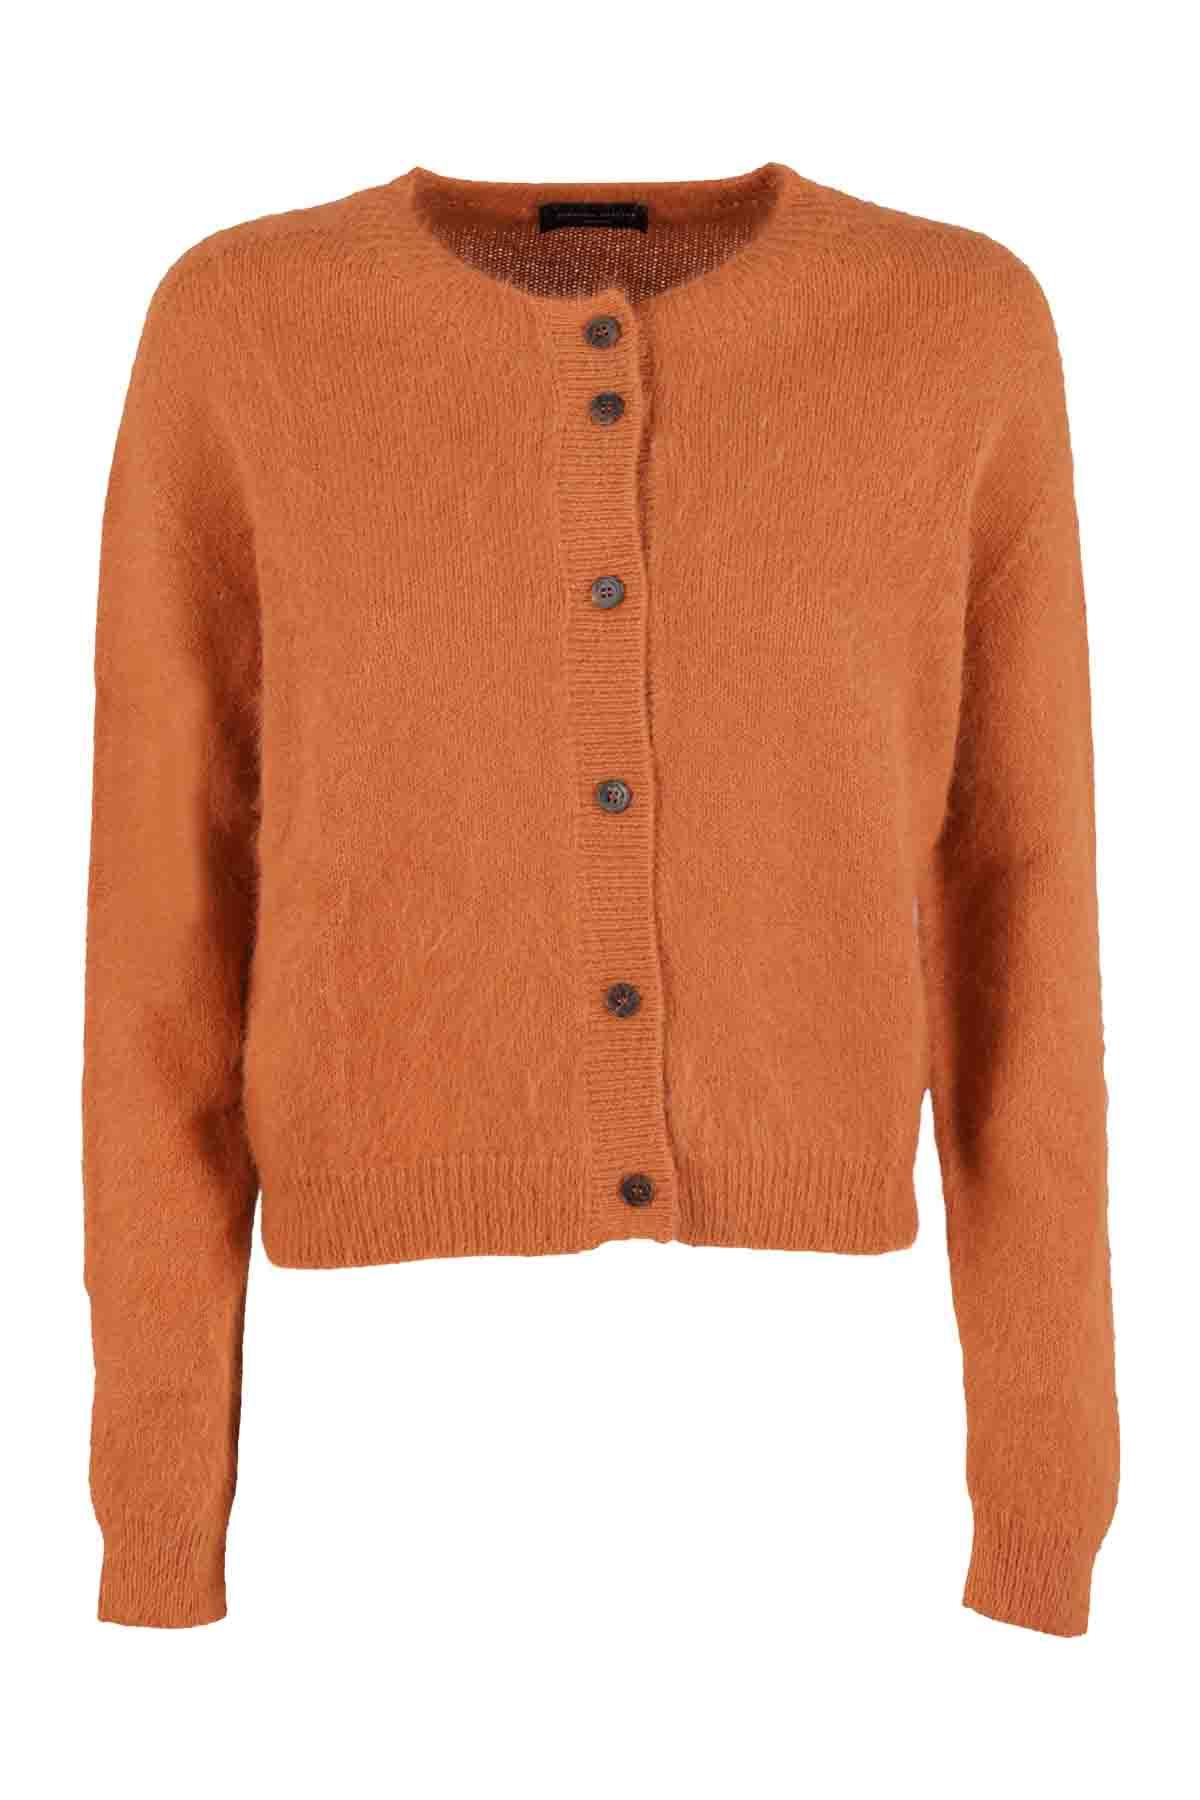 Roberto Collina Sweater